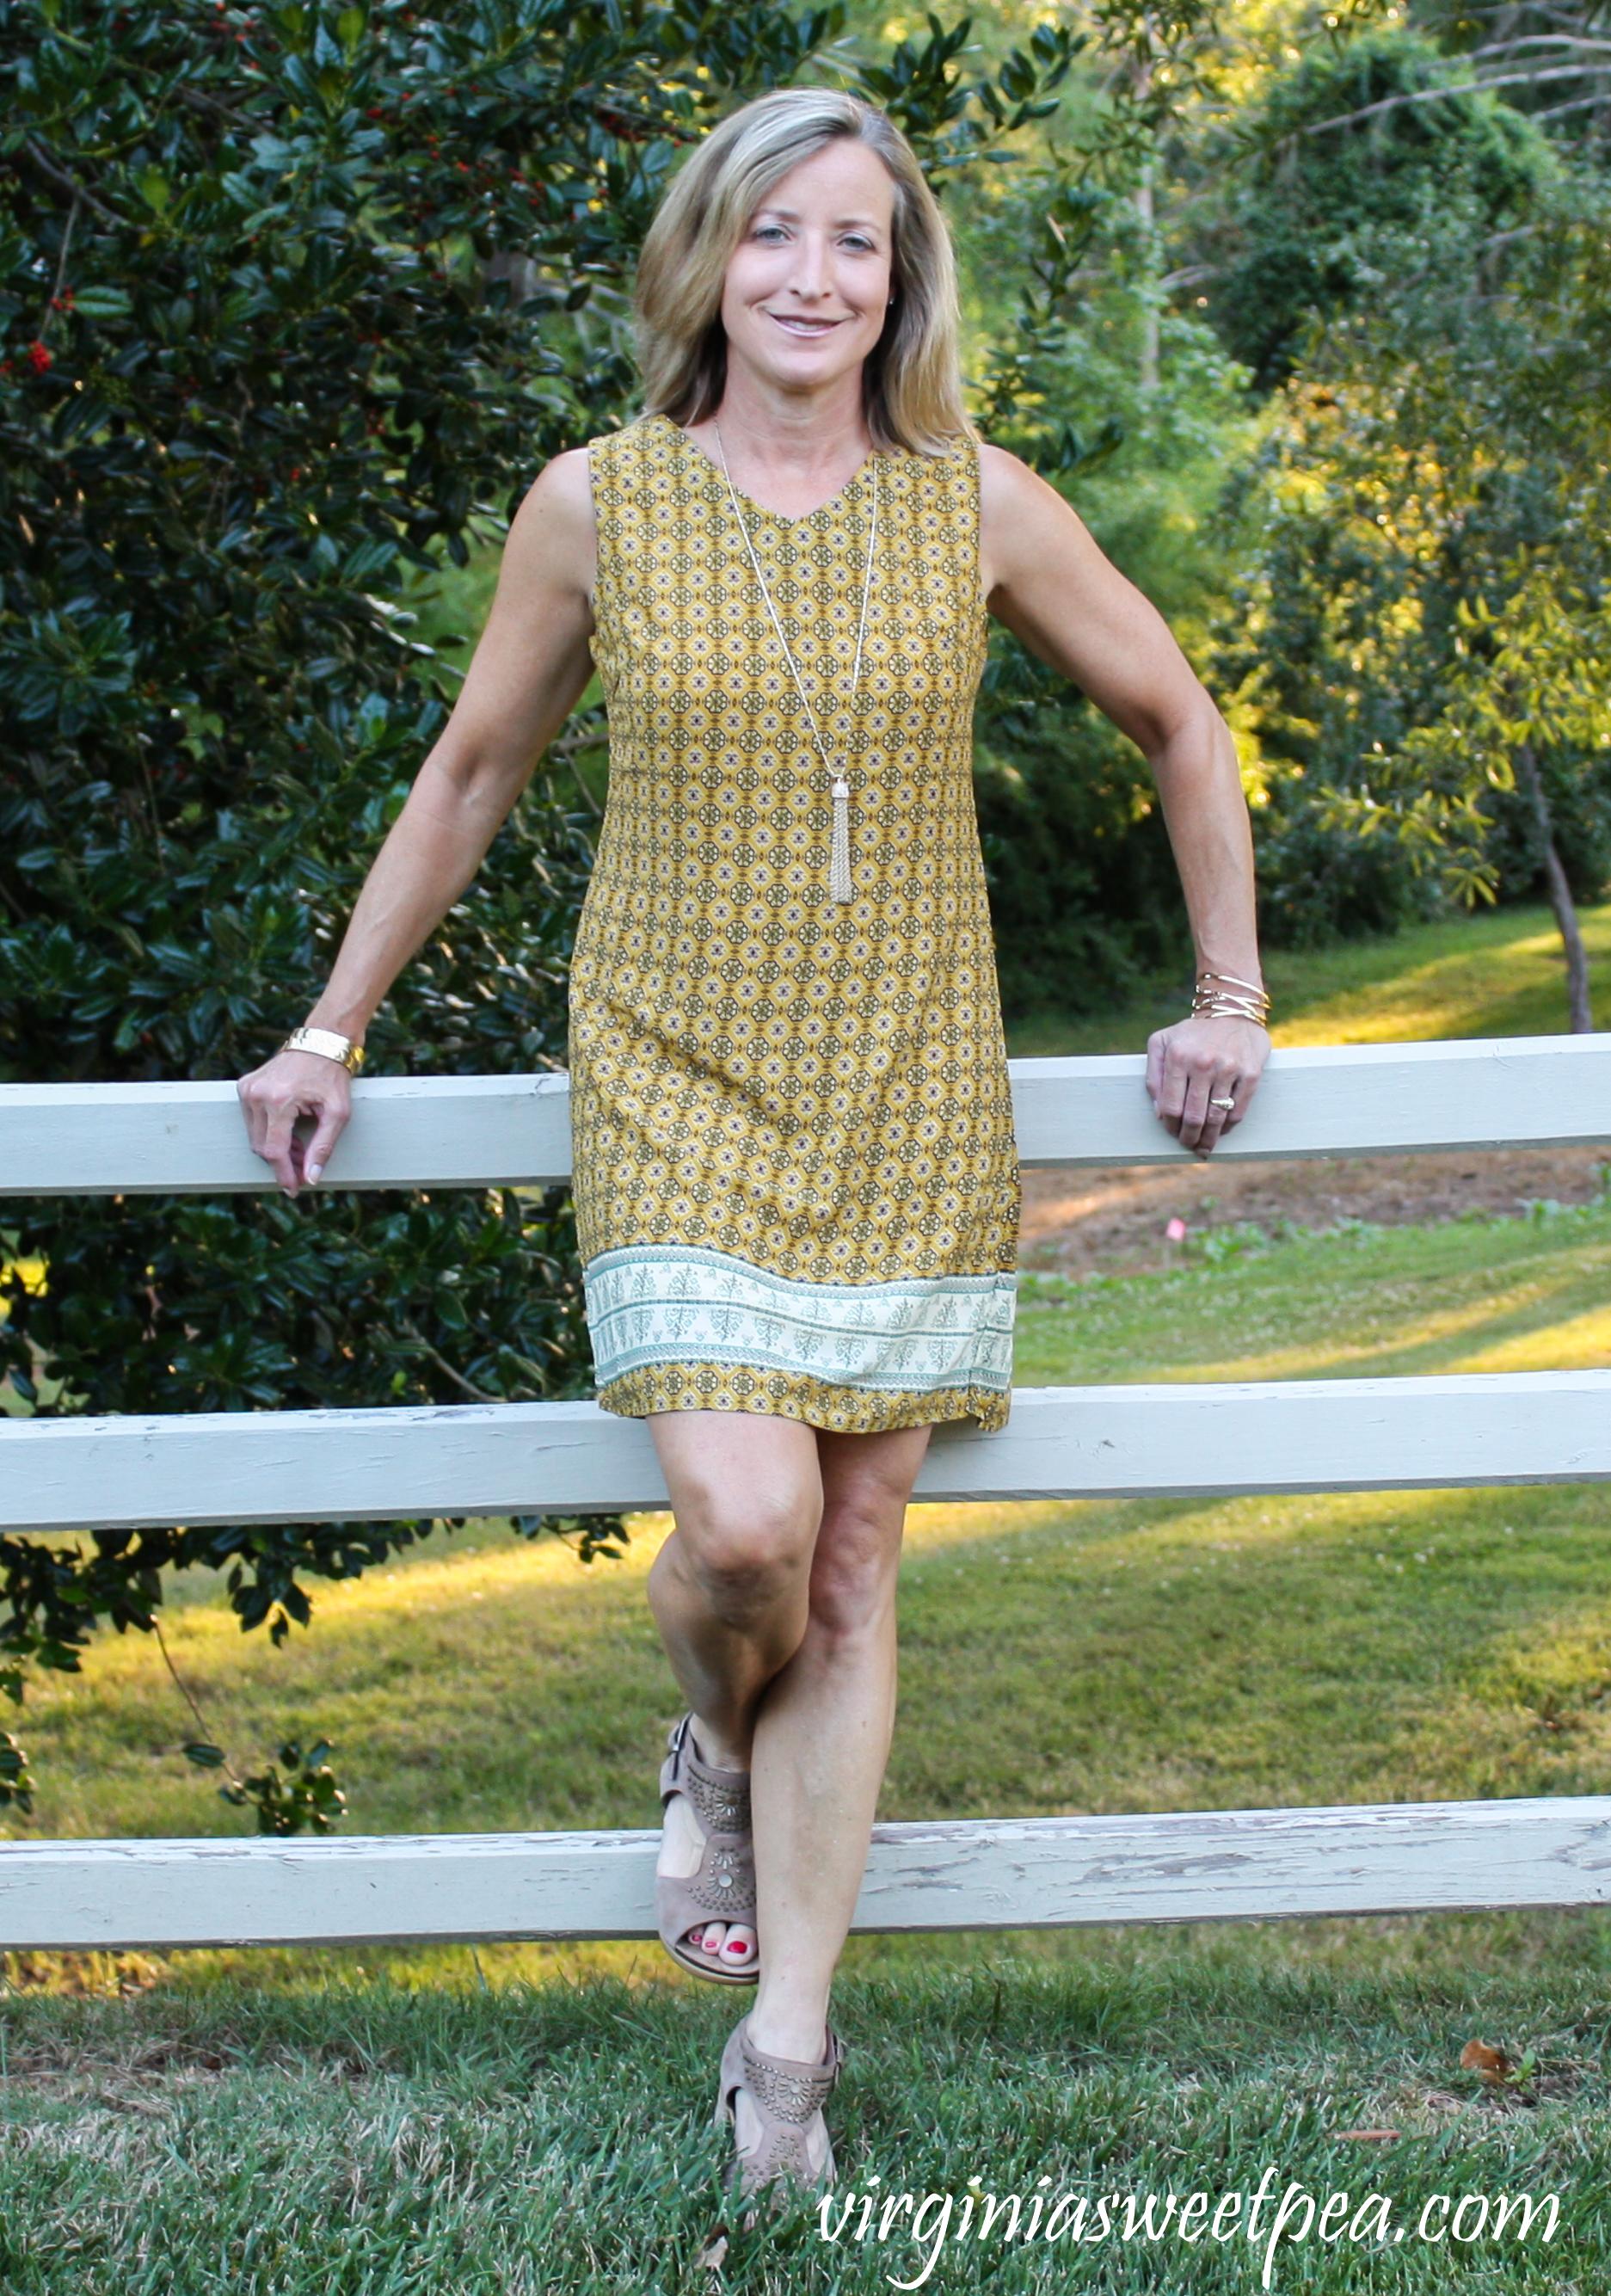 Fashom Review - SM Wardrobe:  Aztec Print Shift Dress #fashom #fashomreview #betterasiam #summerstyle #summerdress via @spaula